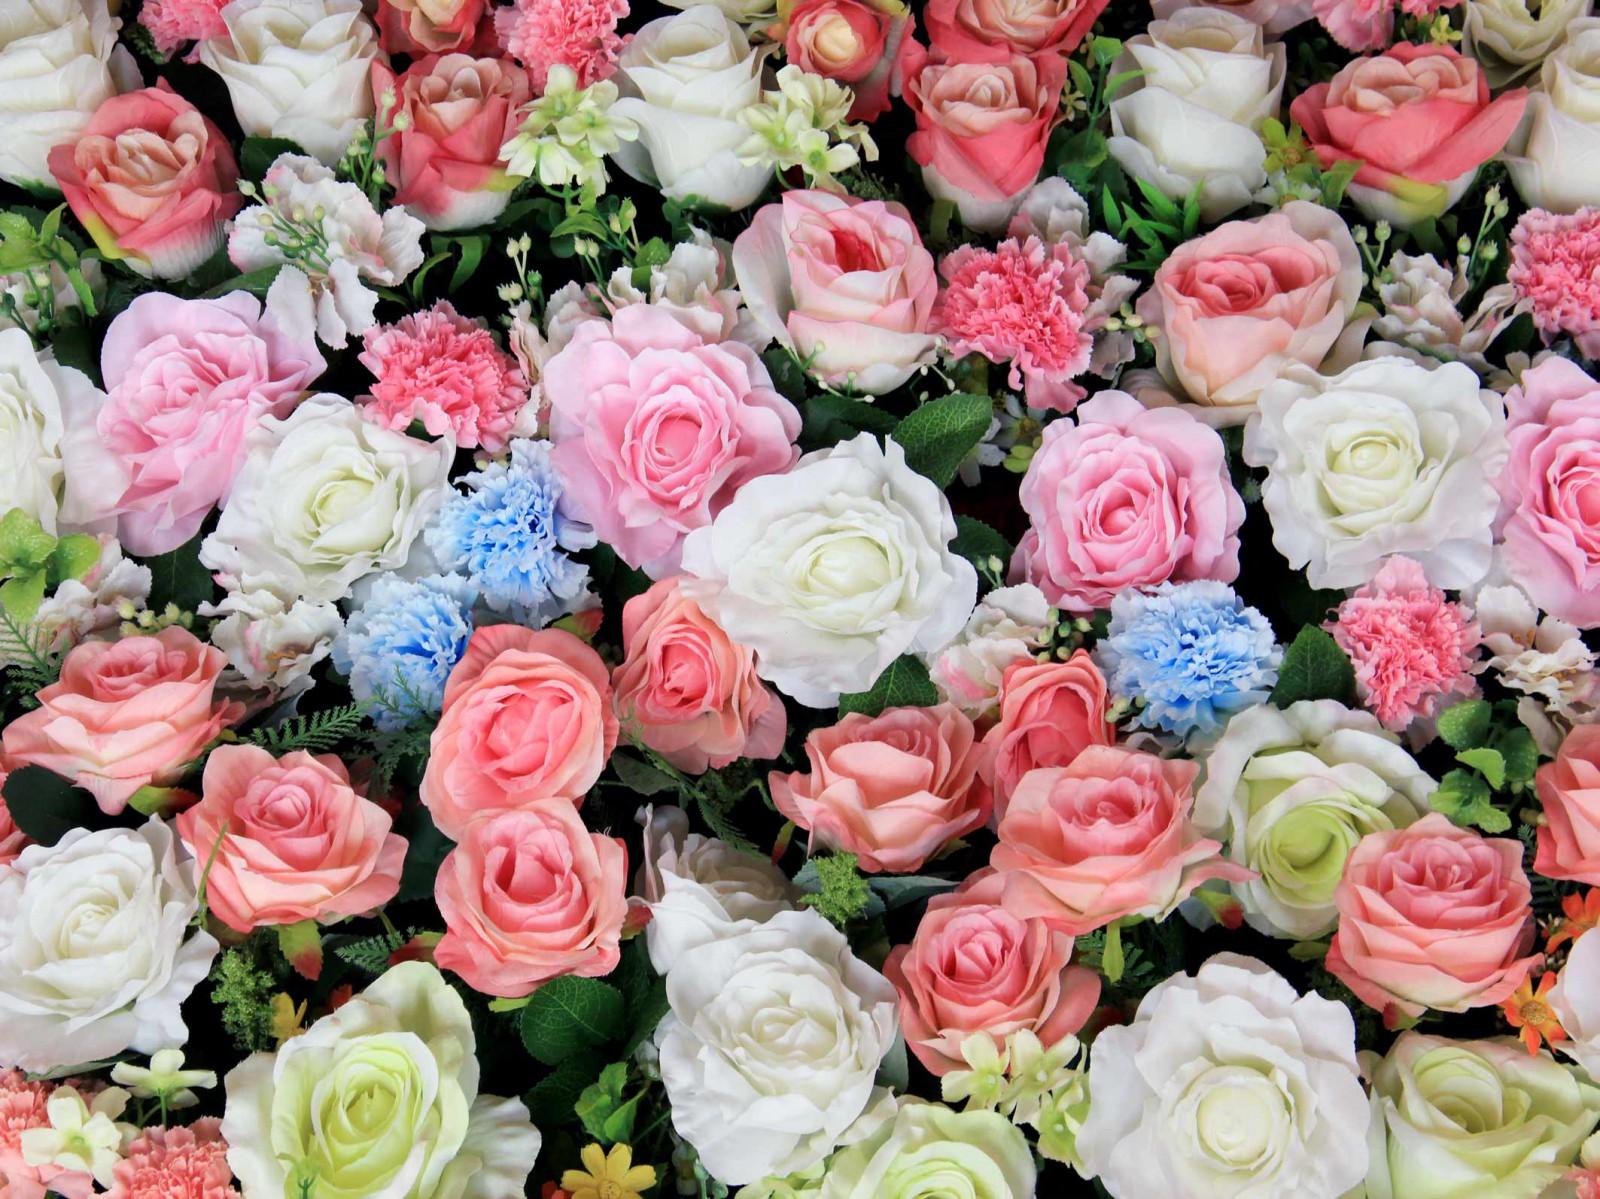 xl fototapete tapete blumen floral rosen natur. Black Bedroom Furniture Sets. Home Design Ideas